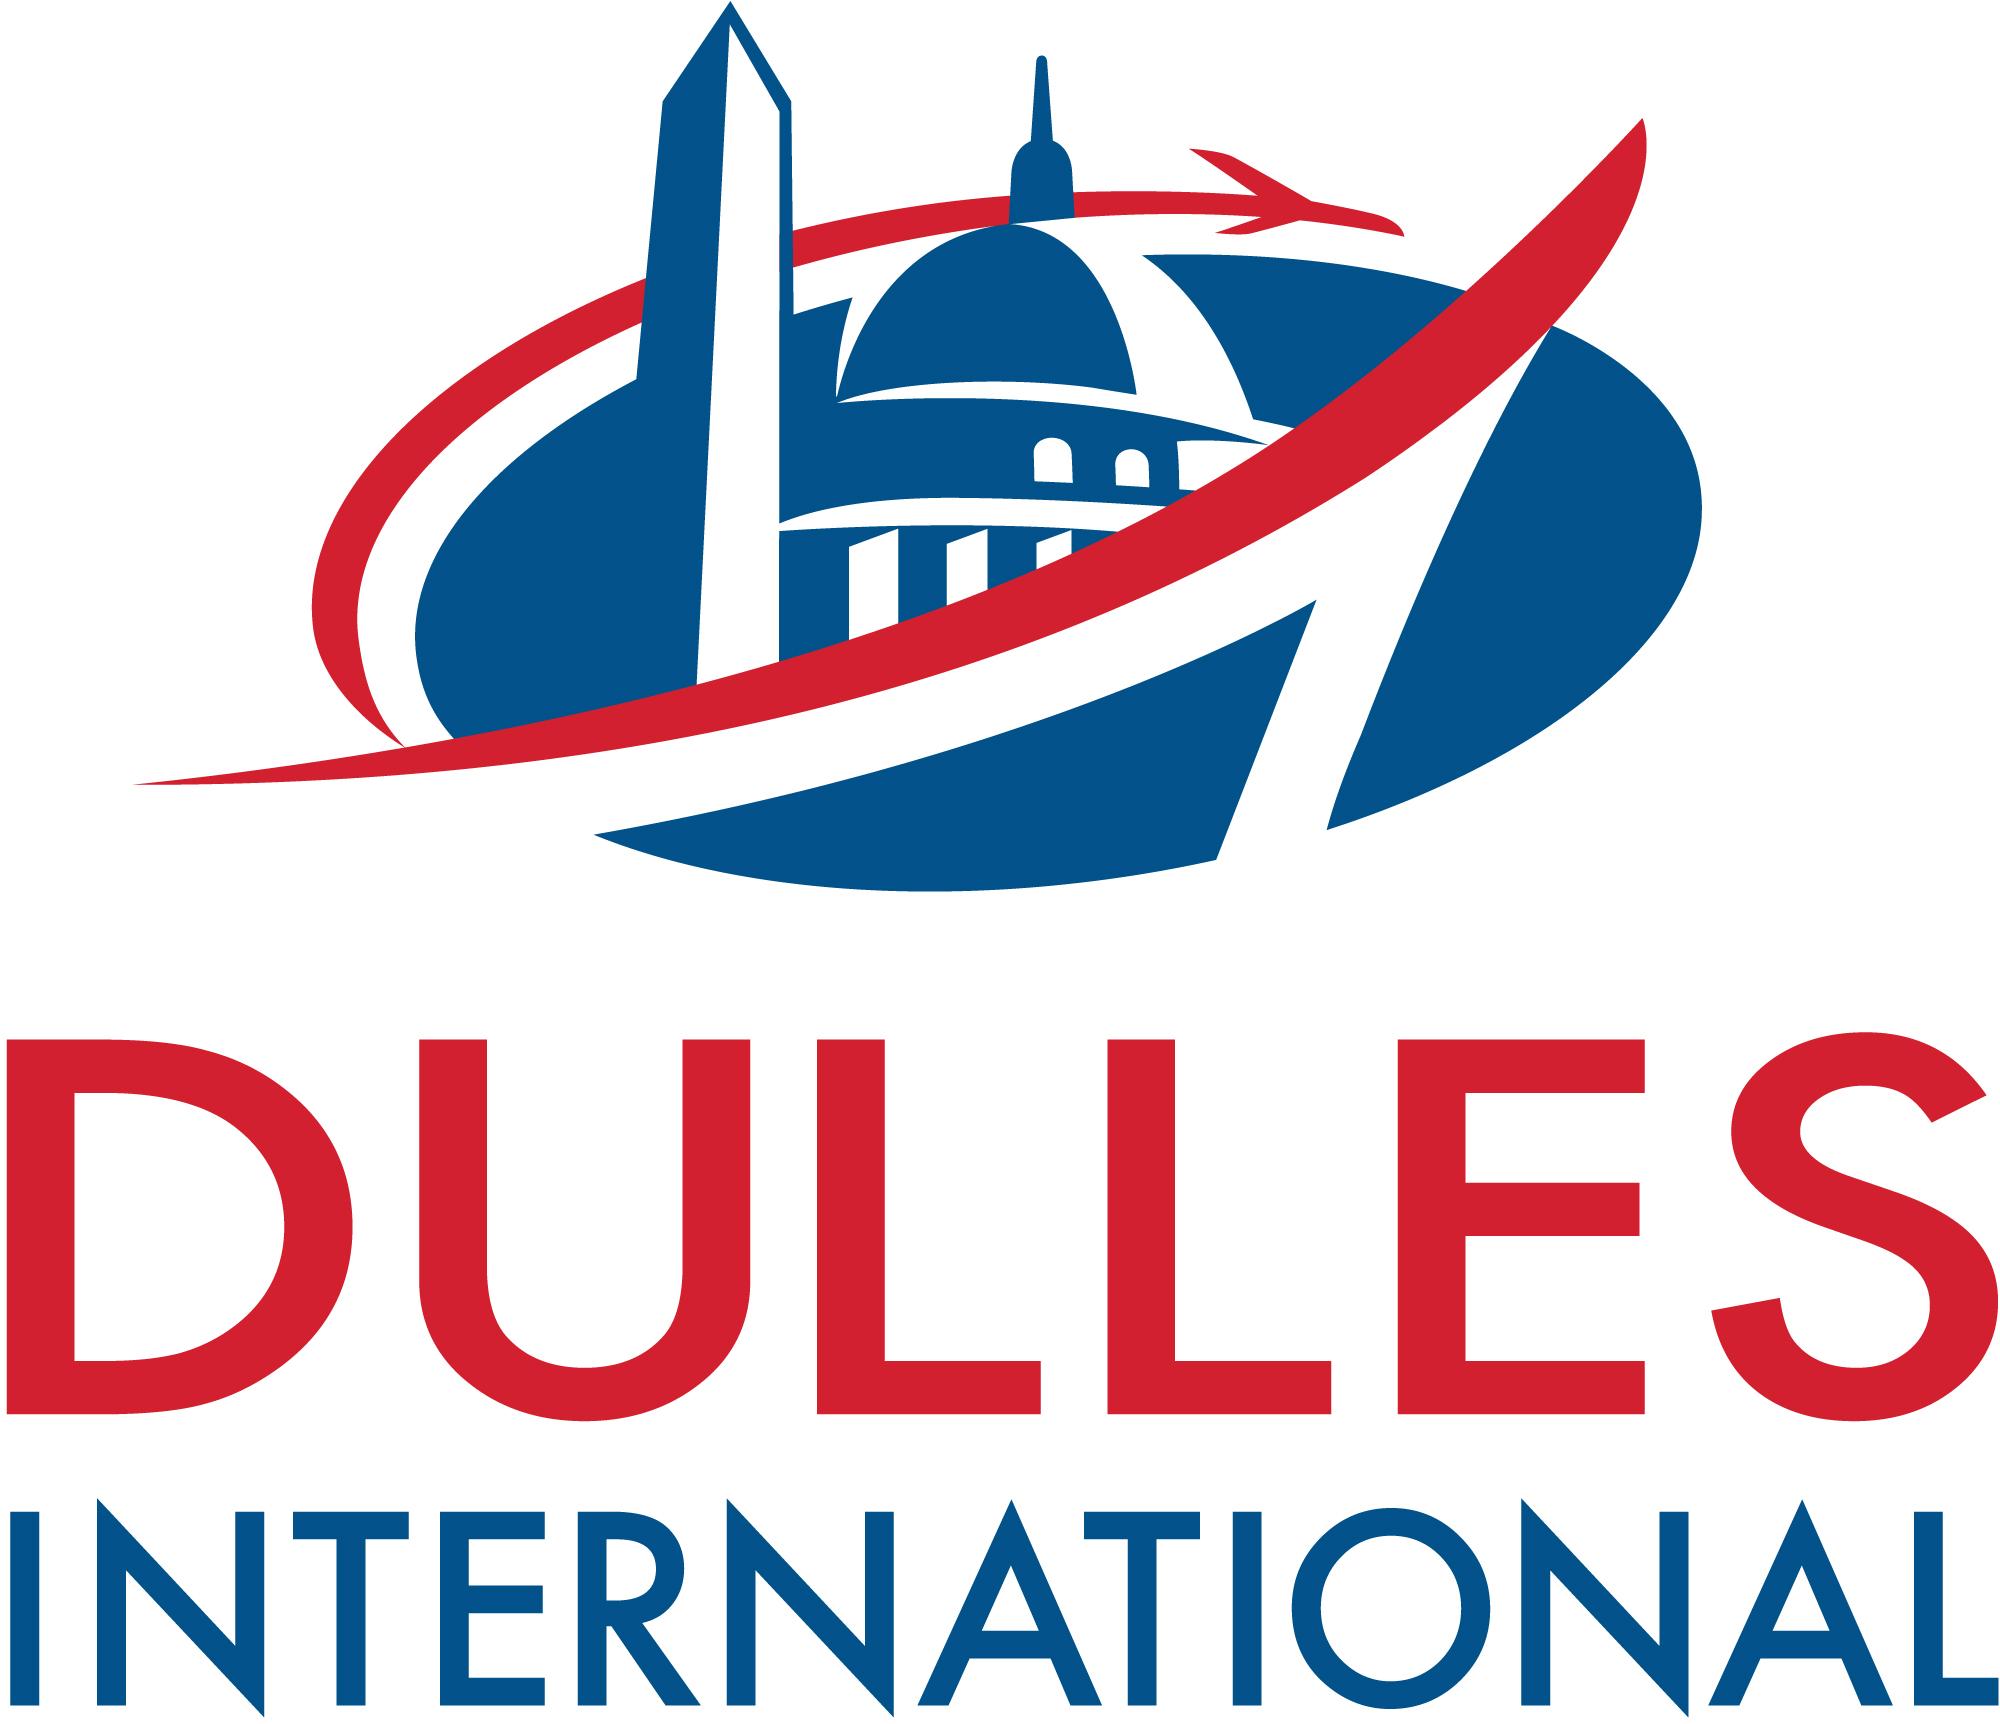 Dulles.jpg